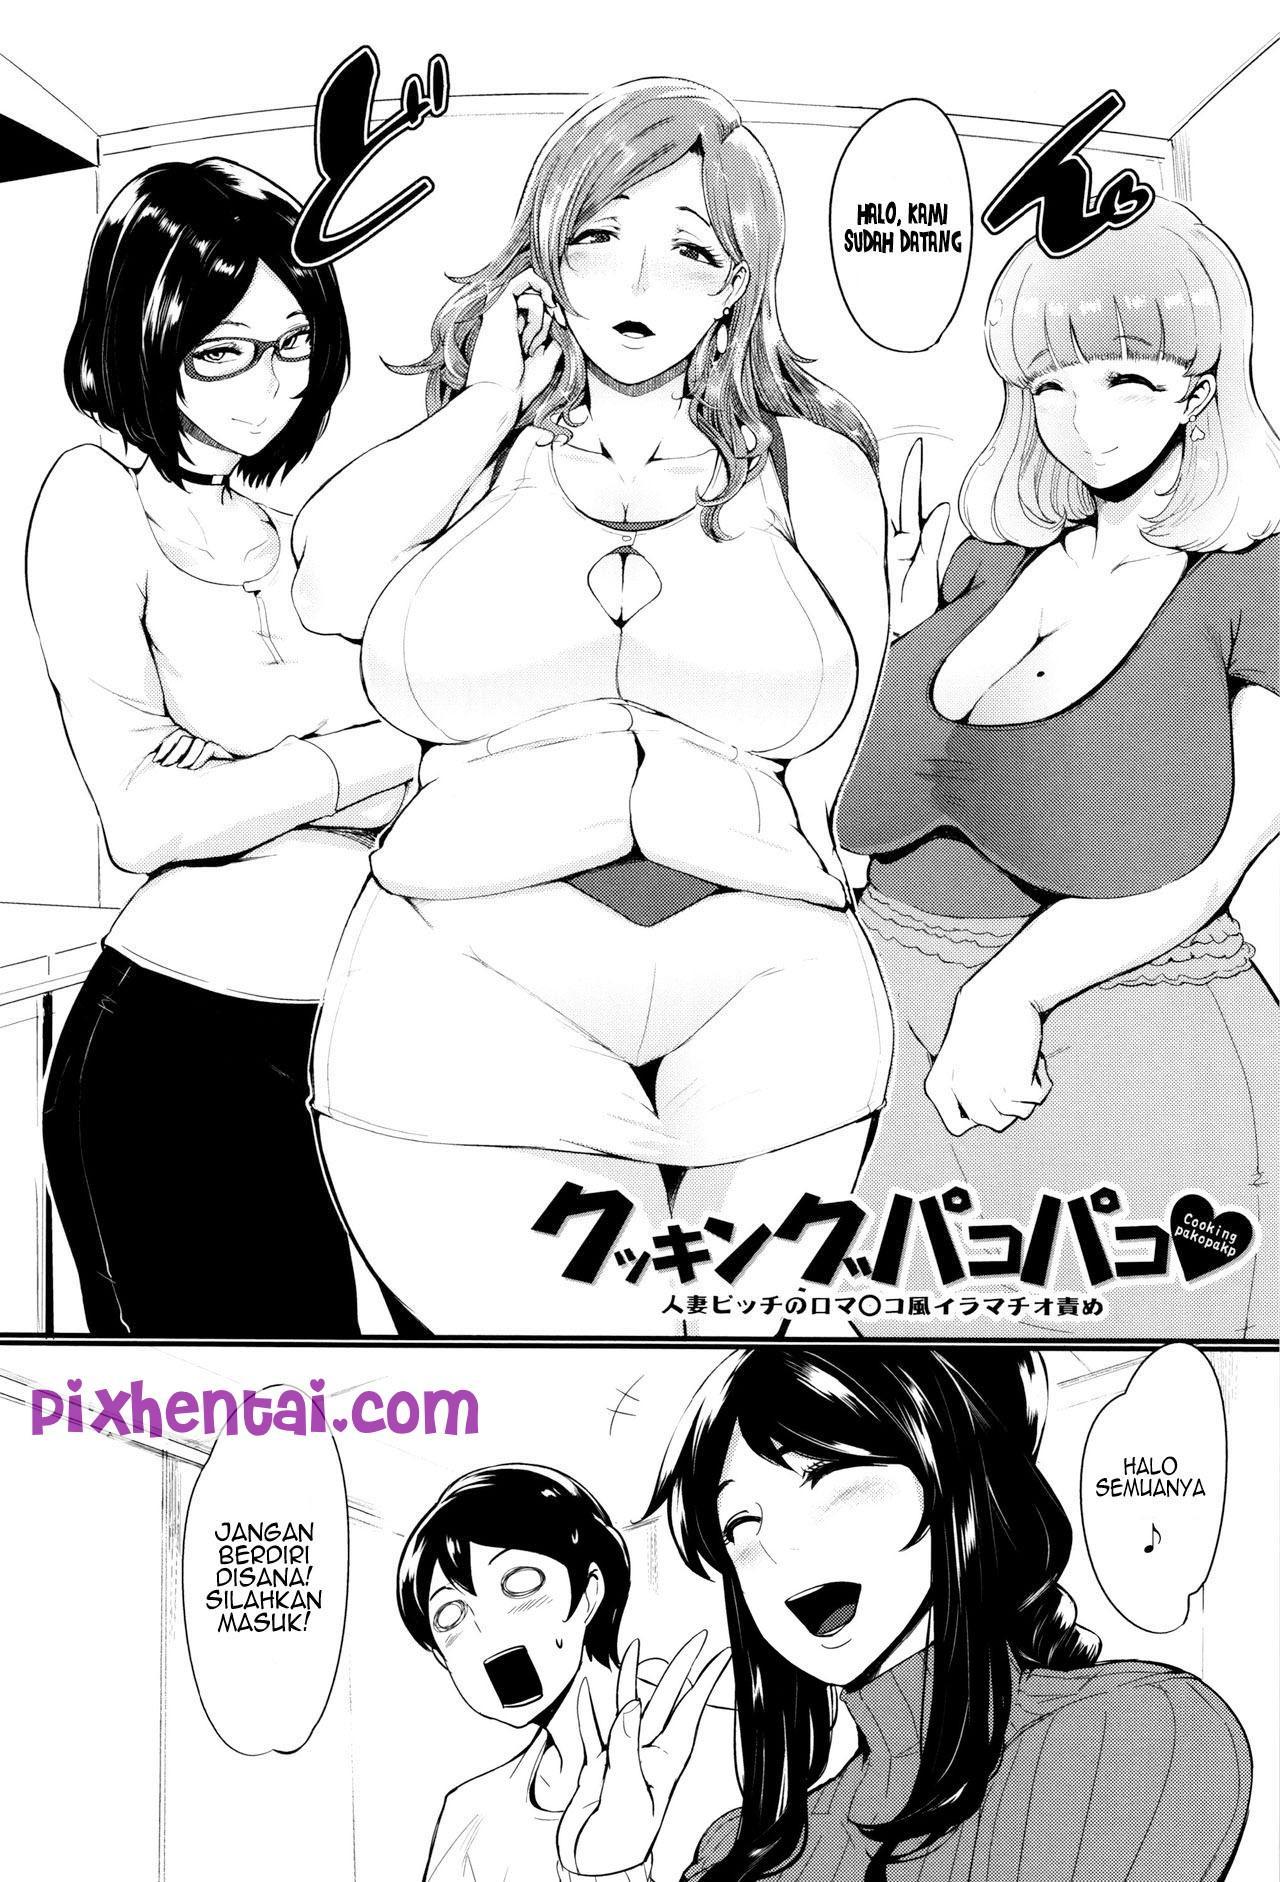 Komik hentai xxx manga sex bokep daya tarik seks teman-teman ibu 02